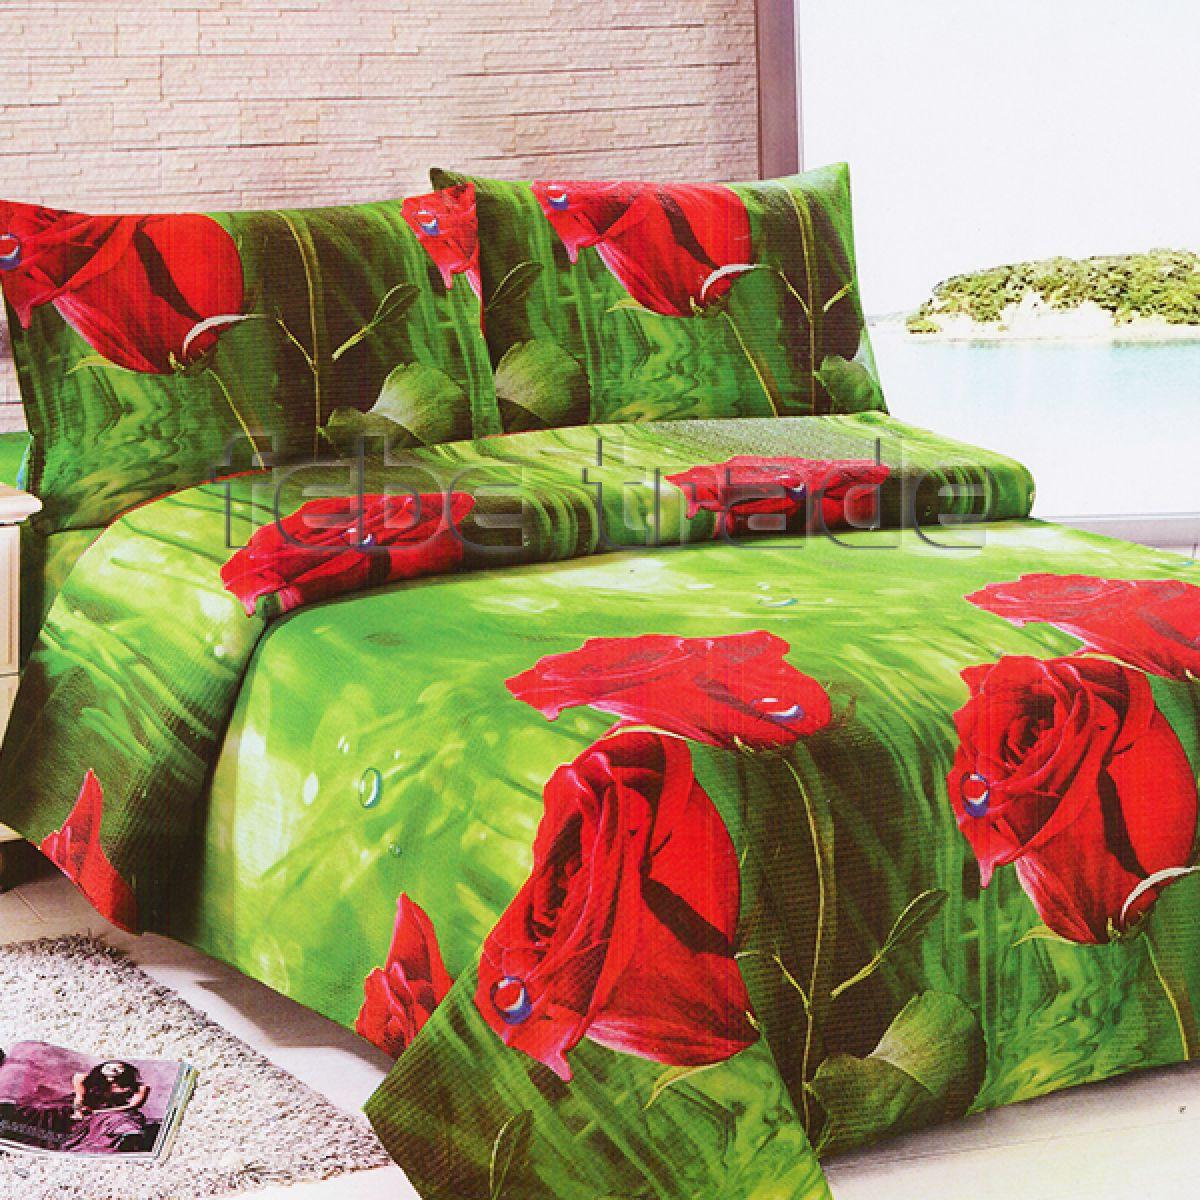 Cheap Beddings - TPR-YP-479 - 220x200cm - 4 pcs